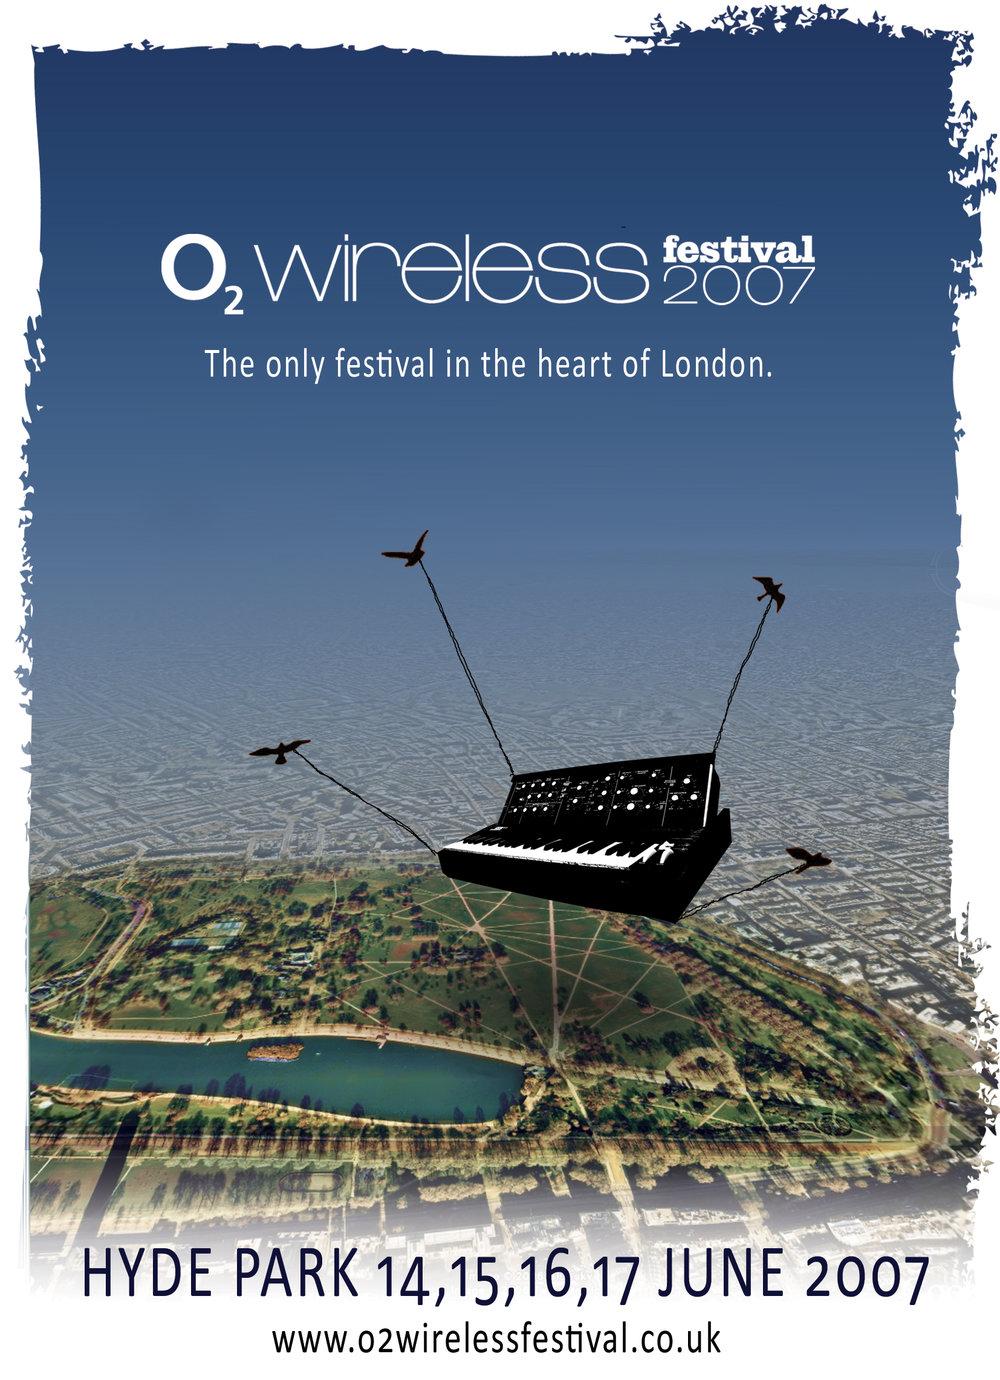 My unused design for the 2007 Wireless Festival